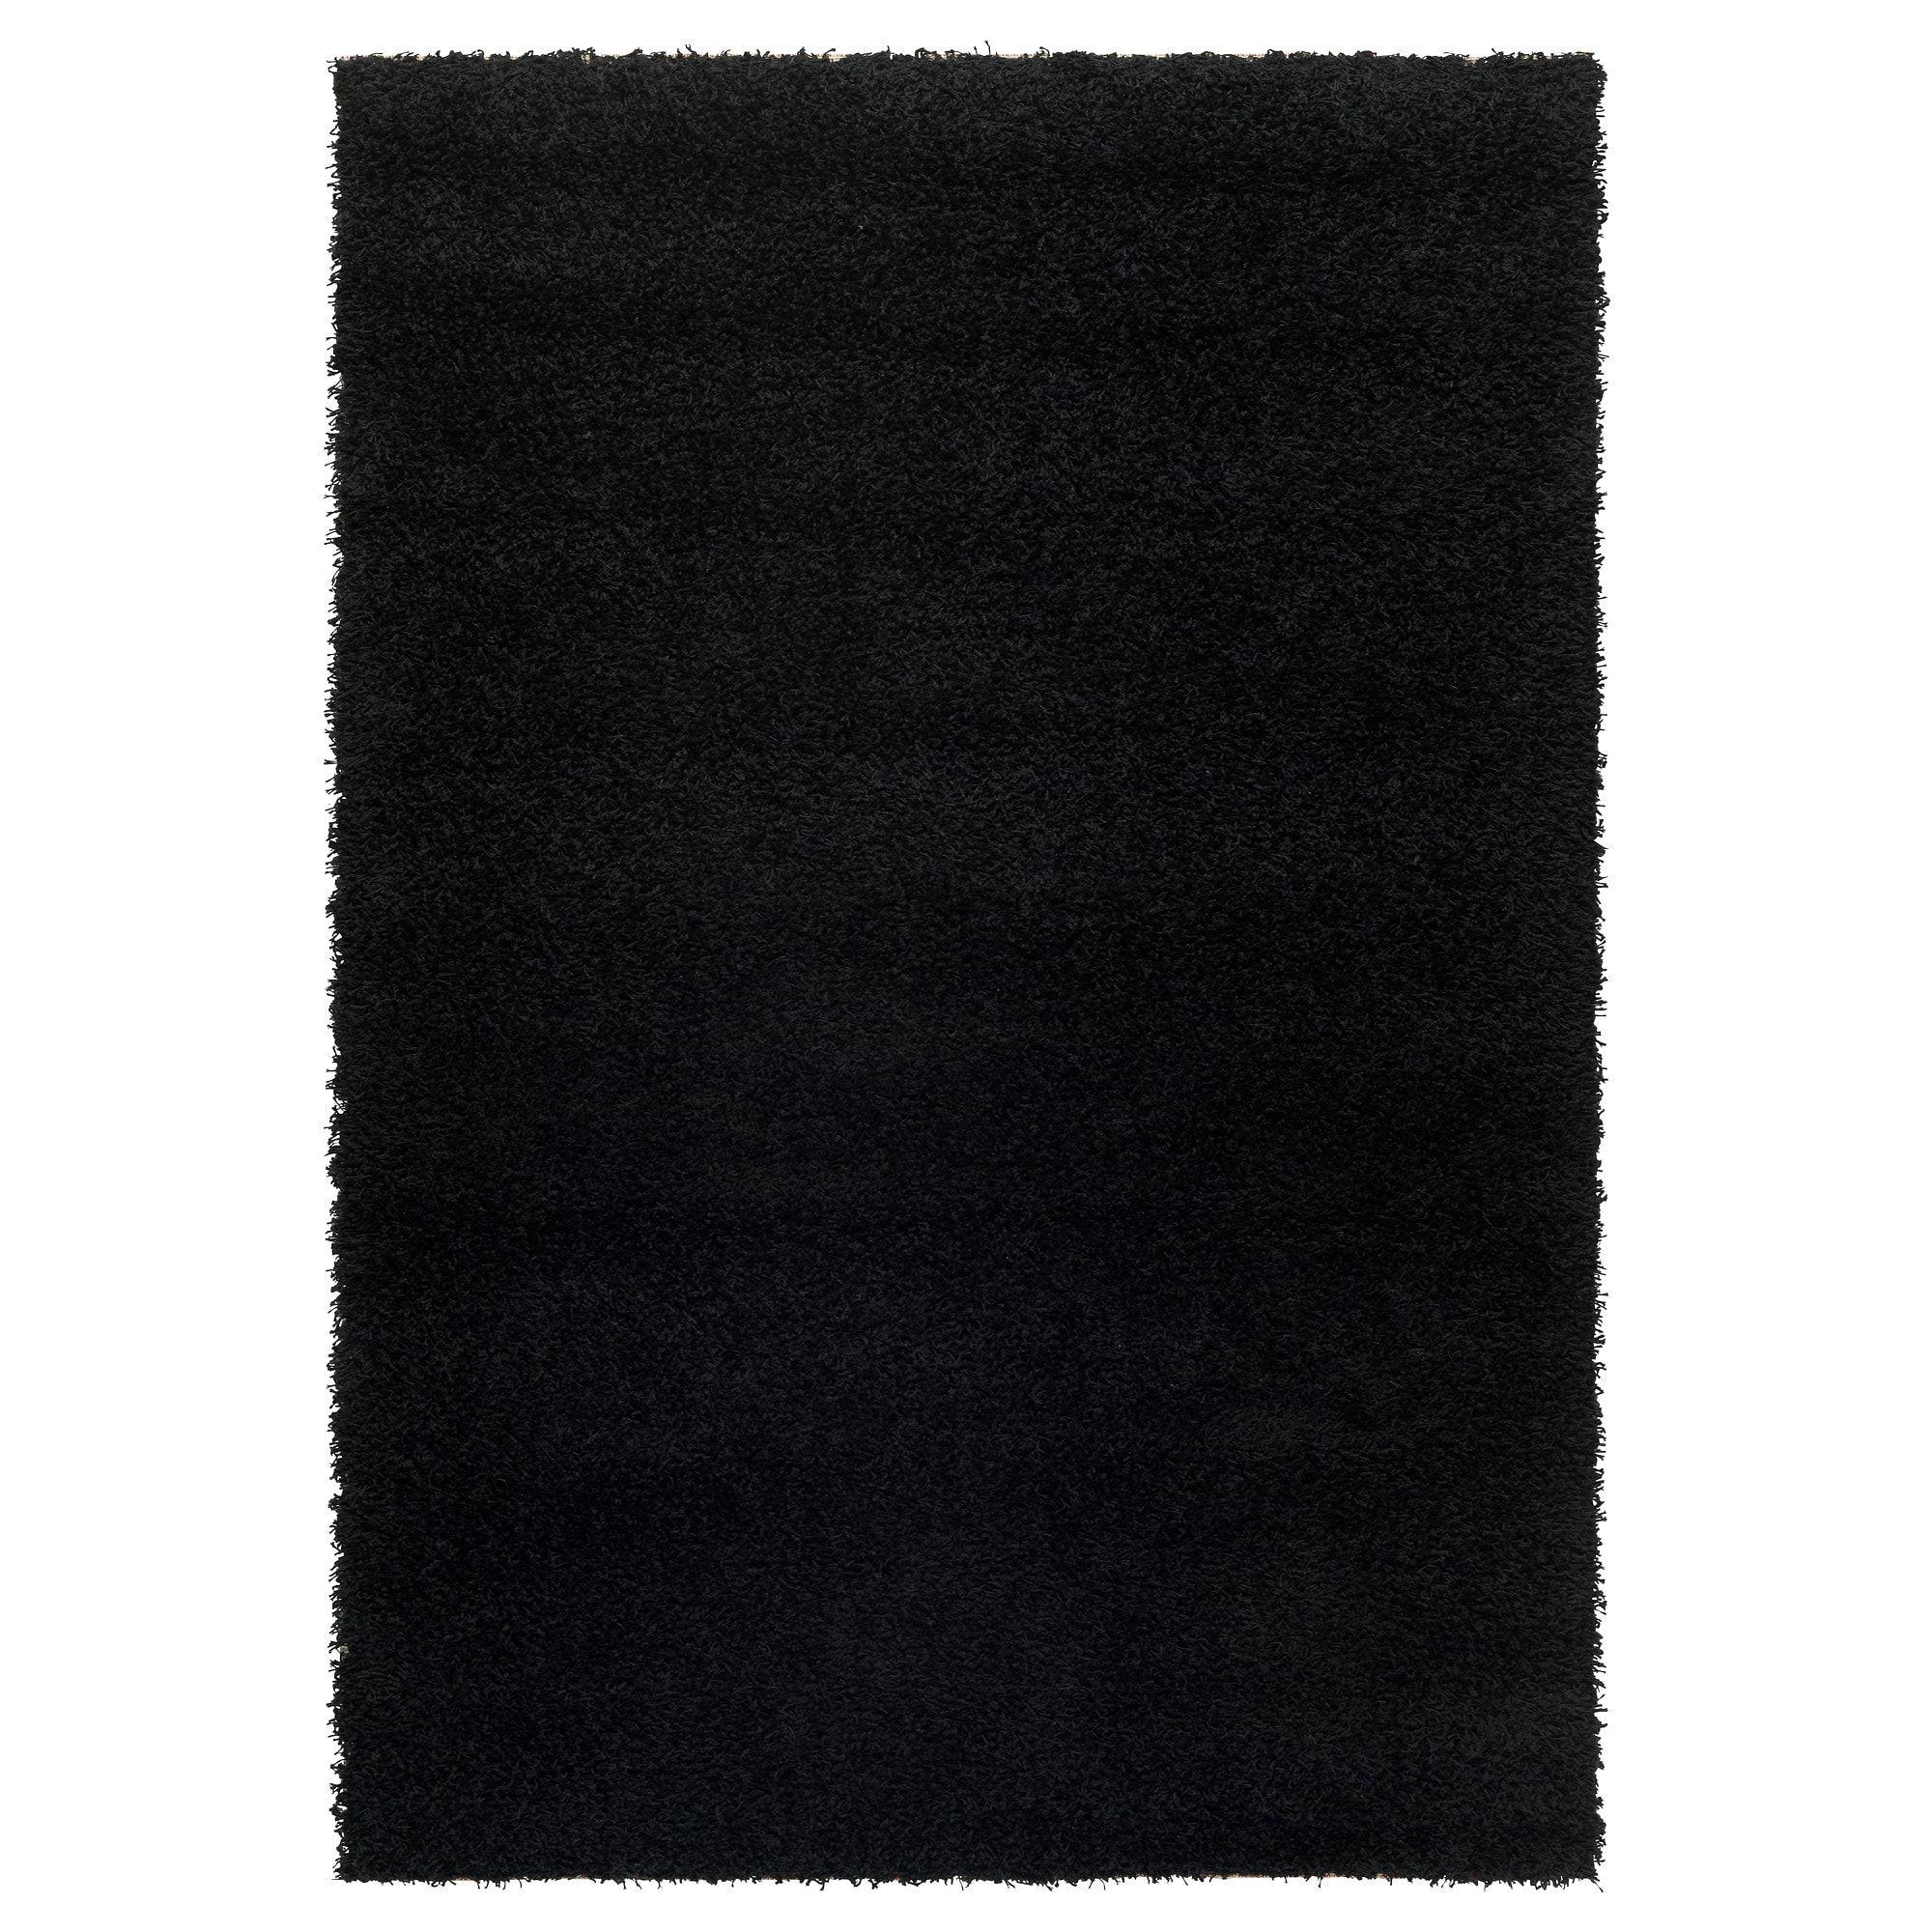 furniture and home furnishings ikea tapis noir tapis. Black Bedroom Furniture Sets. Home Design Ideas